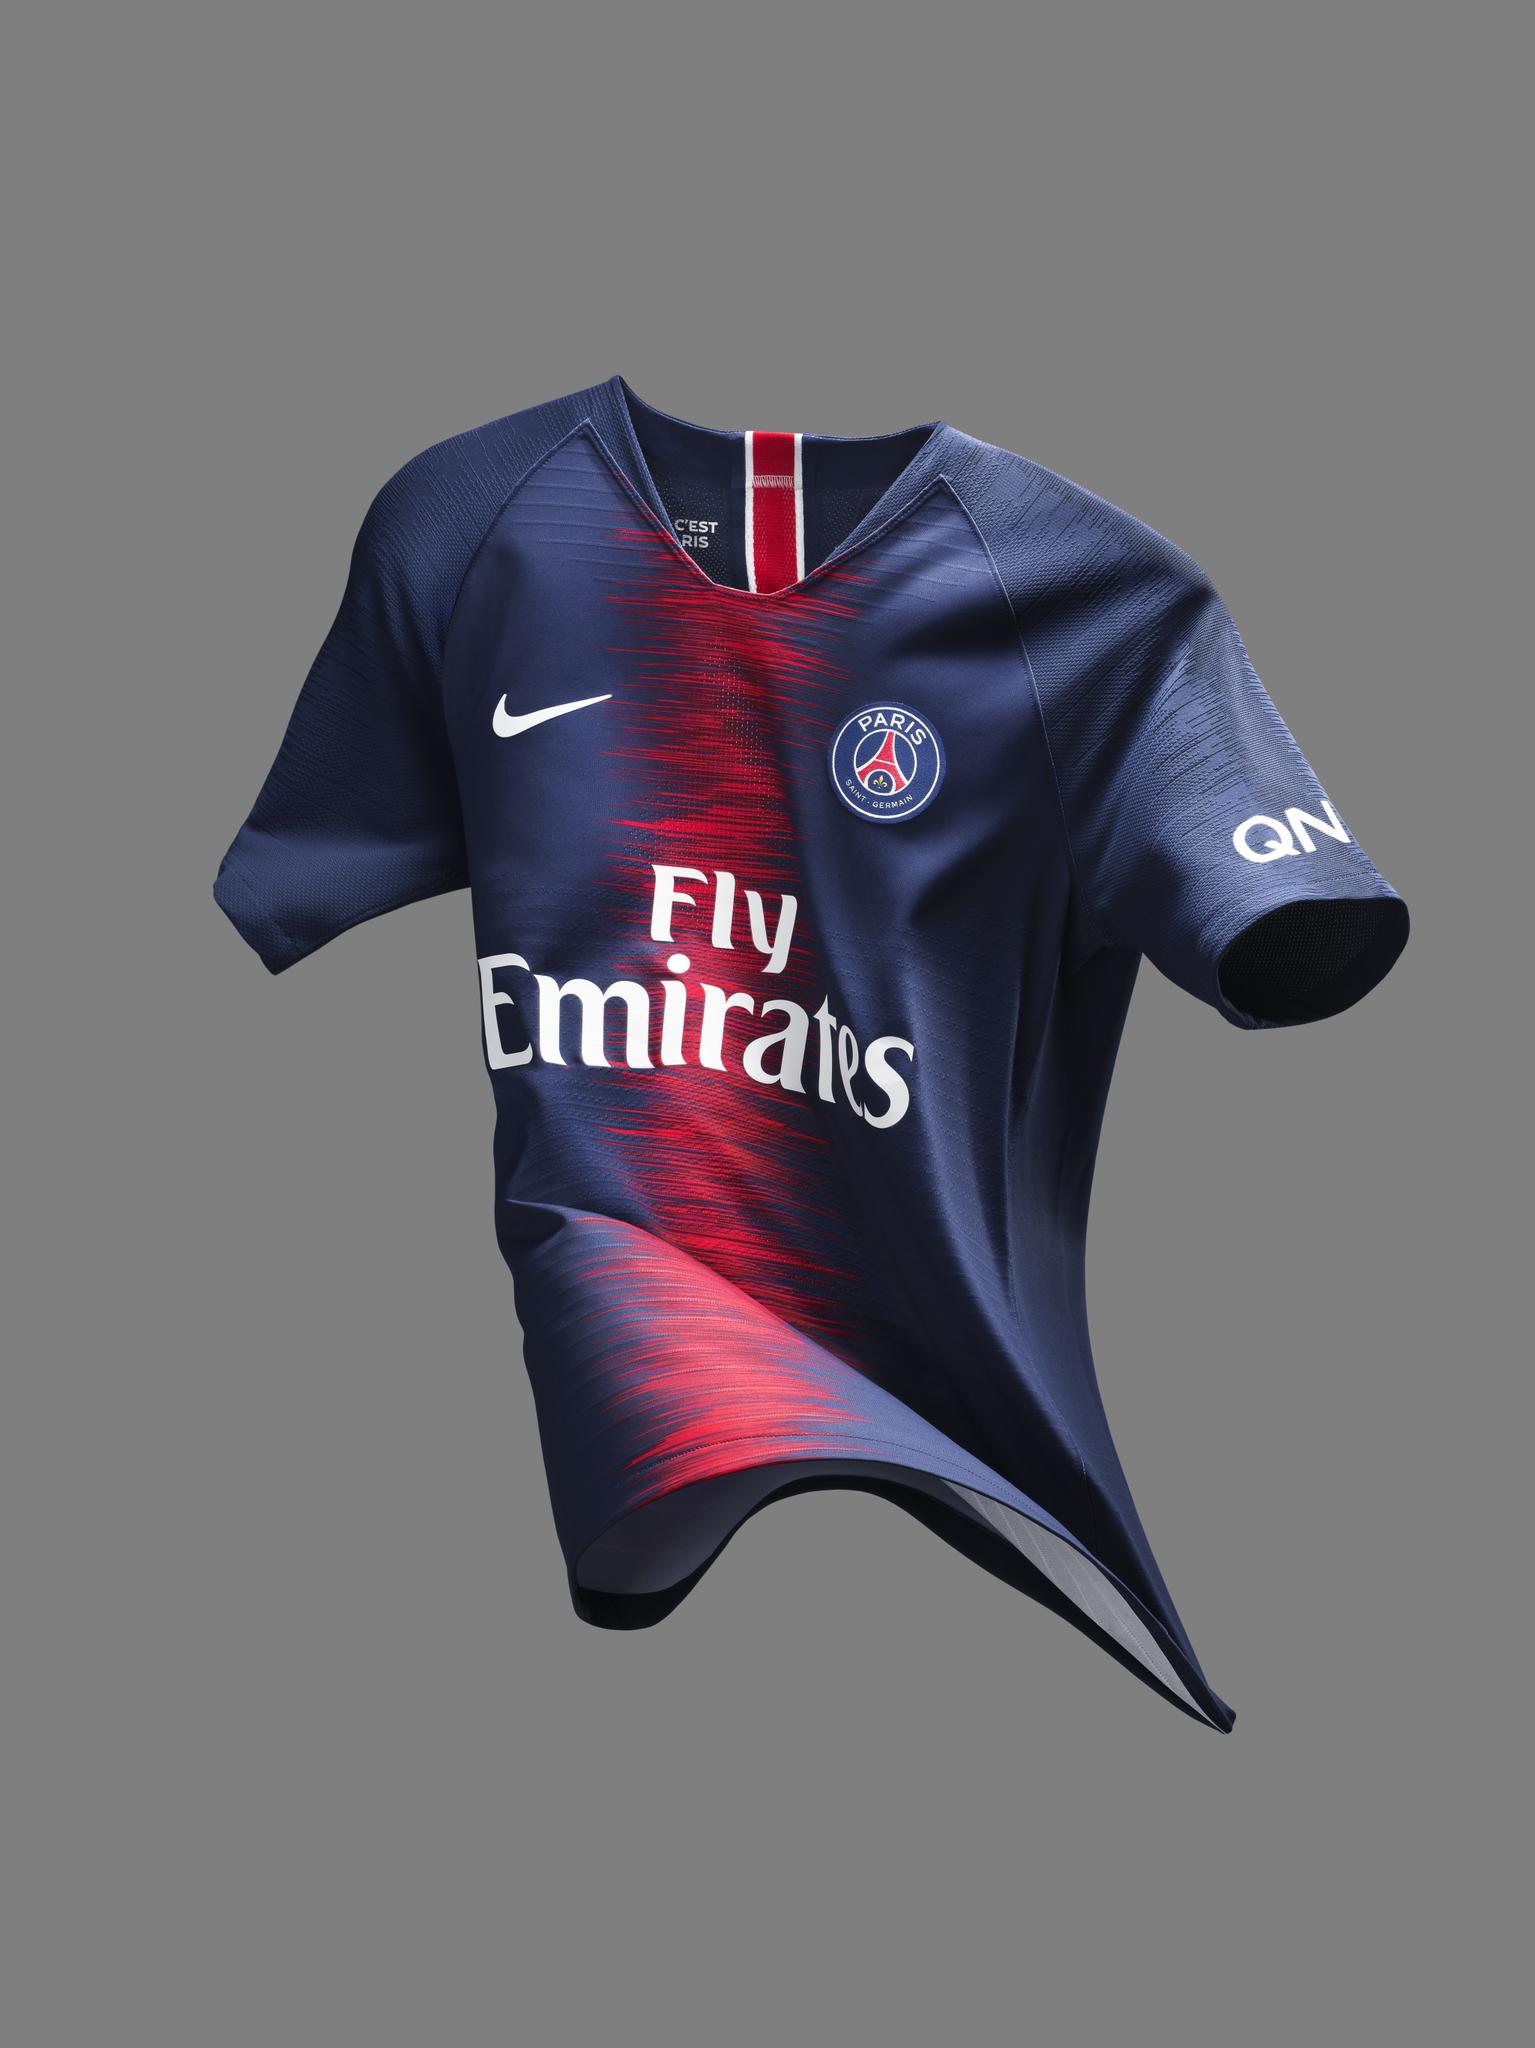 PSG HOME kit 2018 2019 nike football